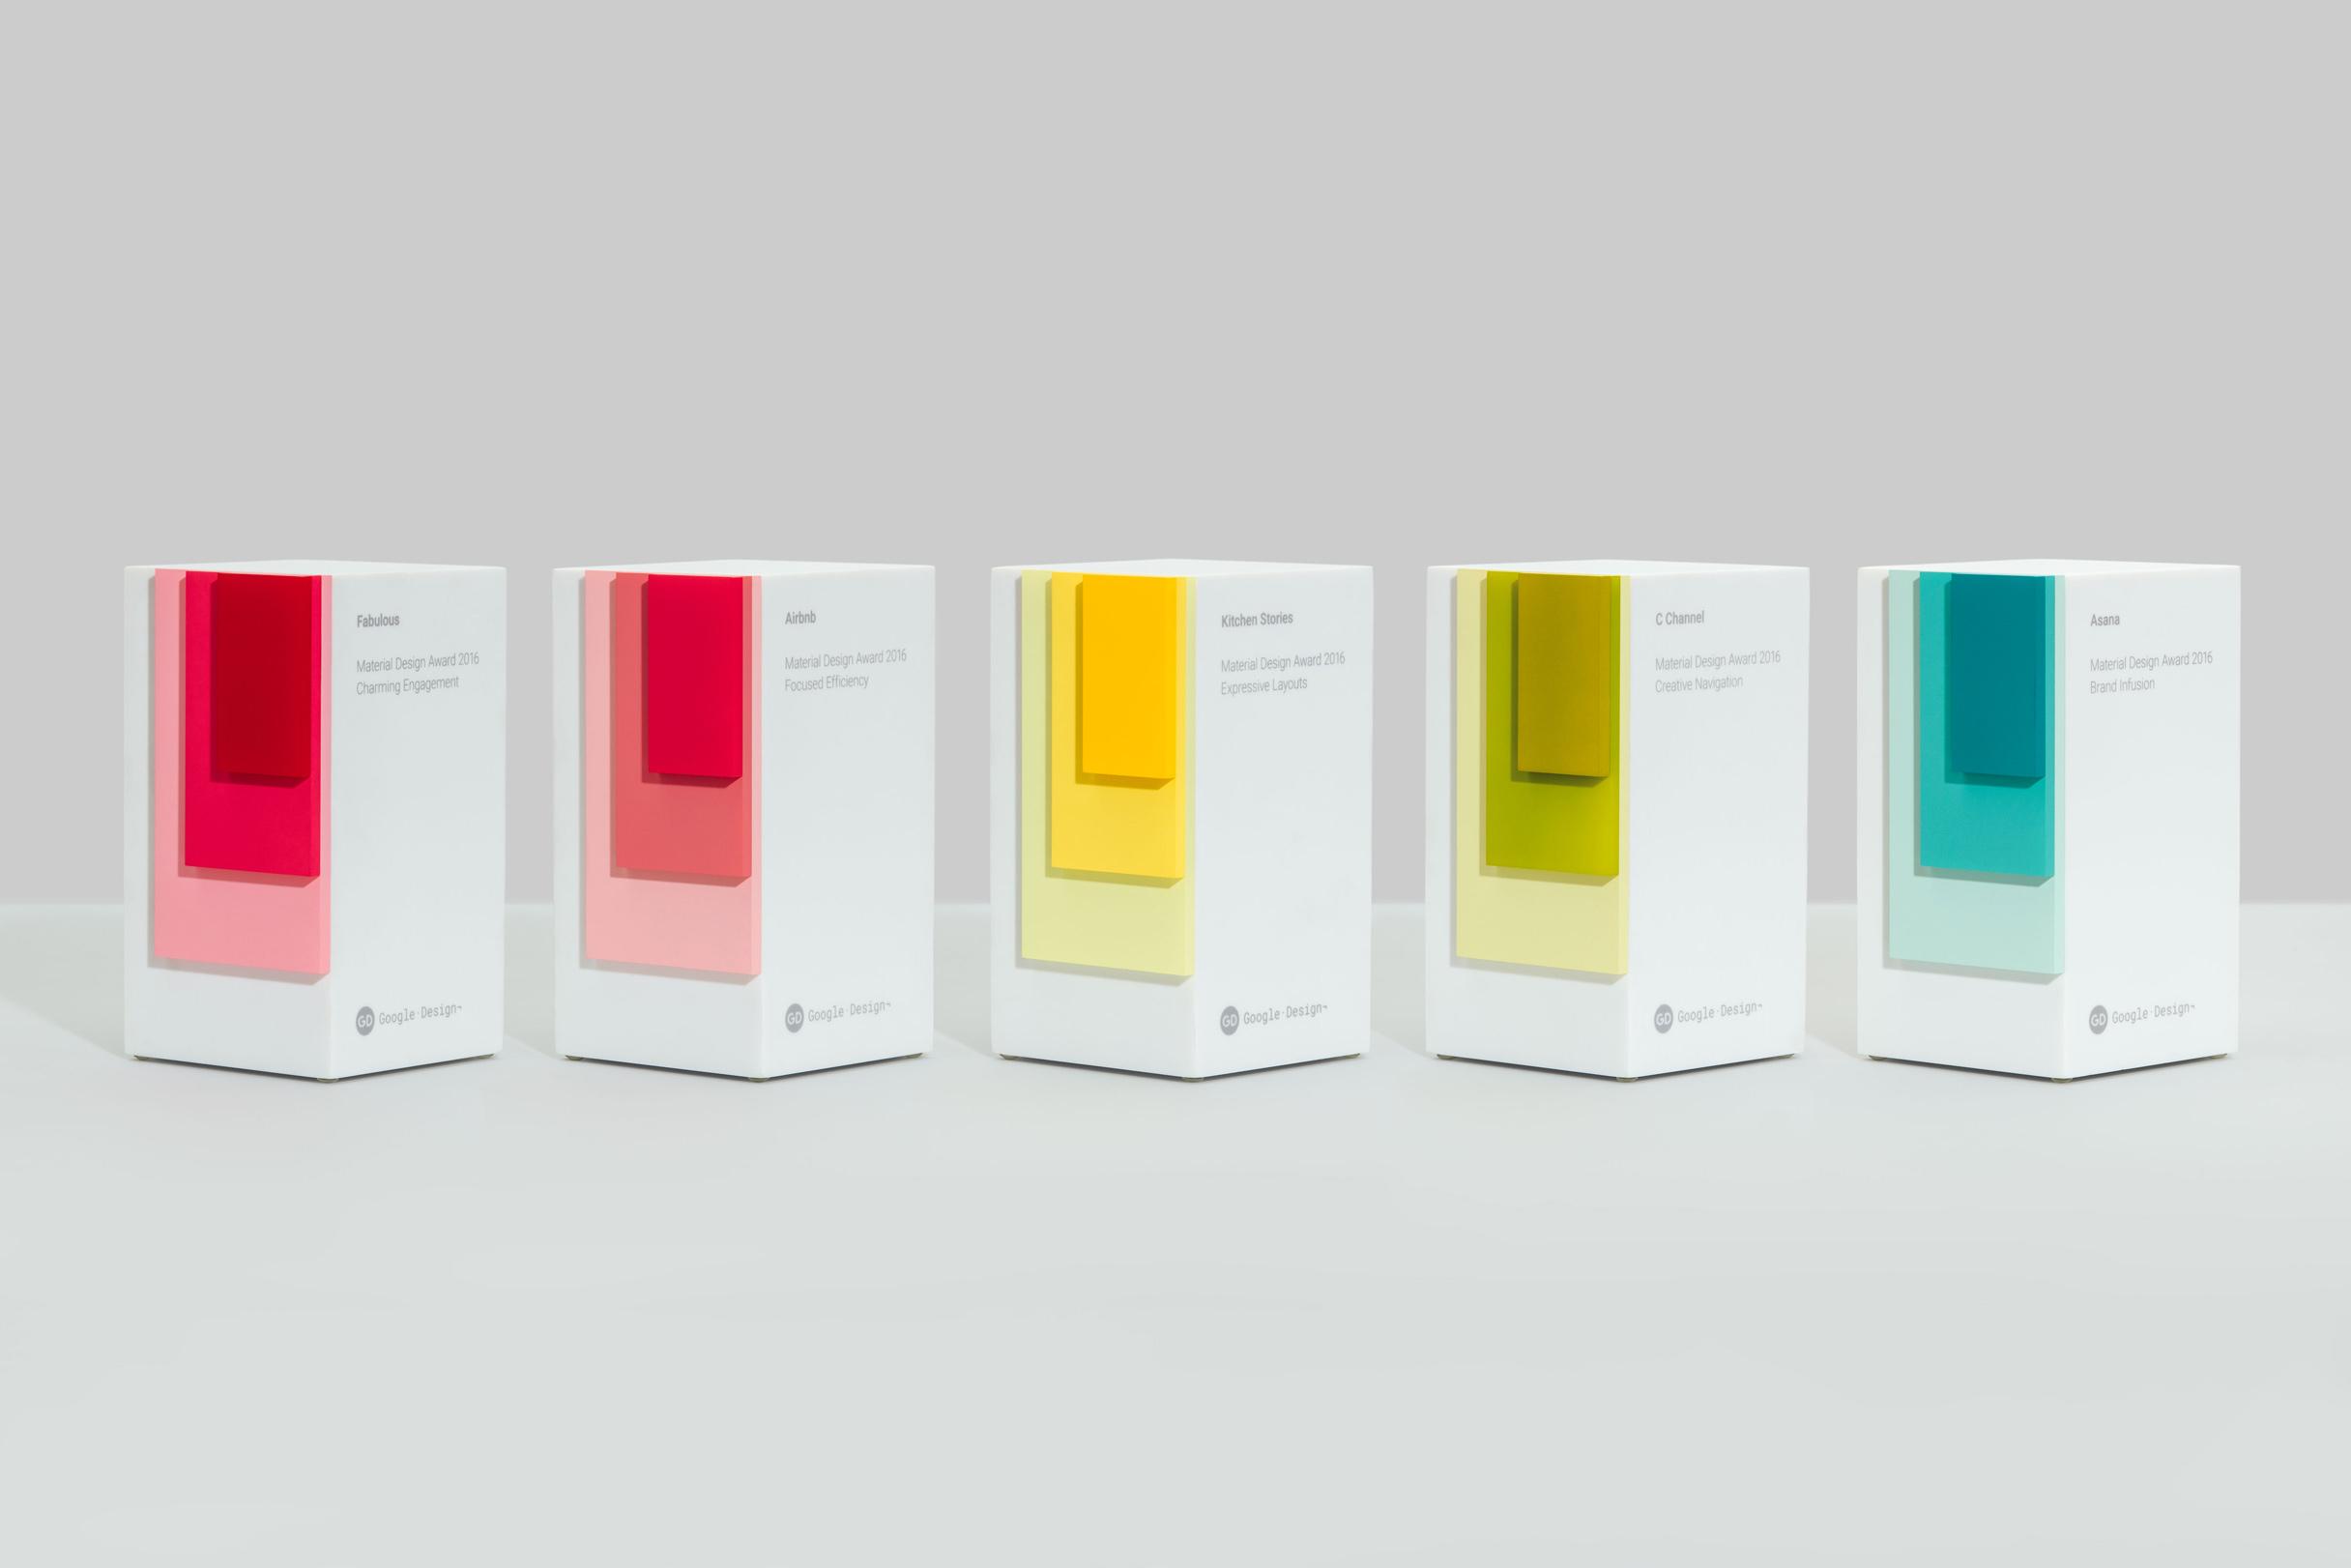 material_design_awards_2016_3x2.jpg